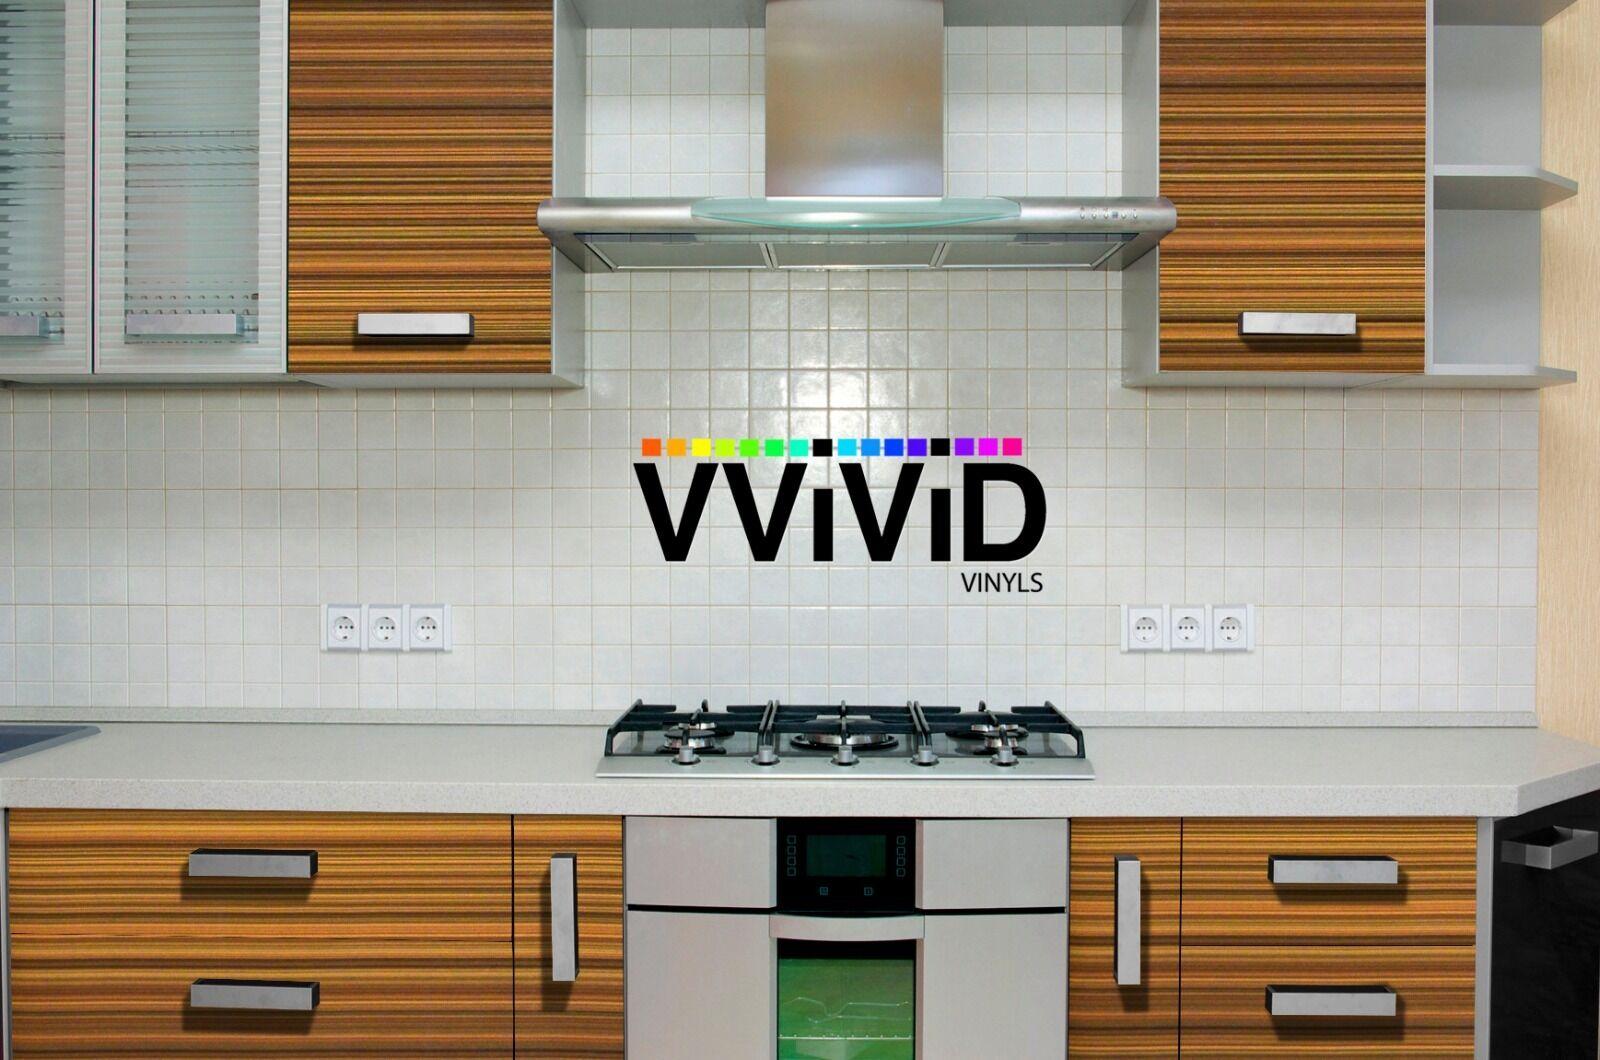 Striped Maple Wood Grain Vinyl Wrap DIY Home Office Furniture Film 75ft x 48